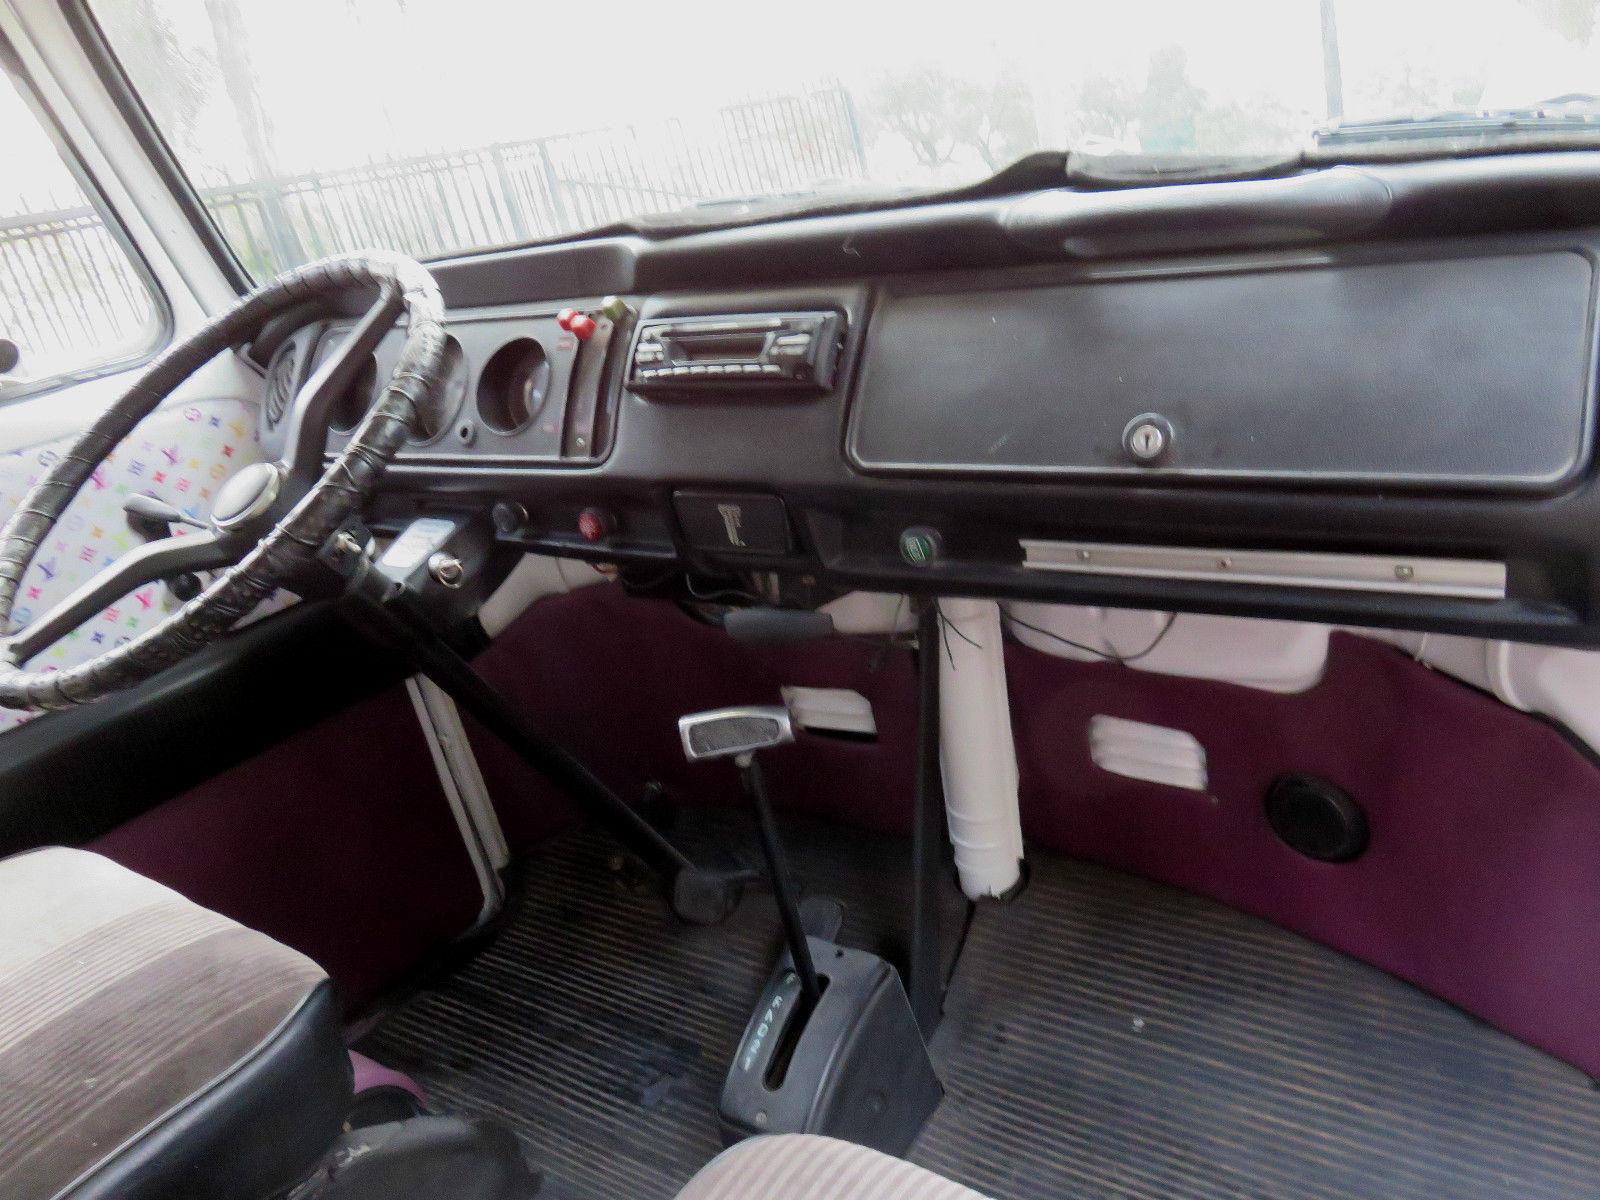 1973 Vw Riviera Camper Automatic Transmission Classic